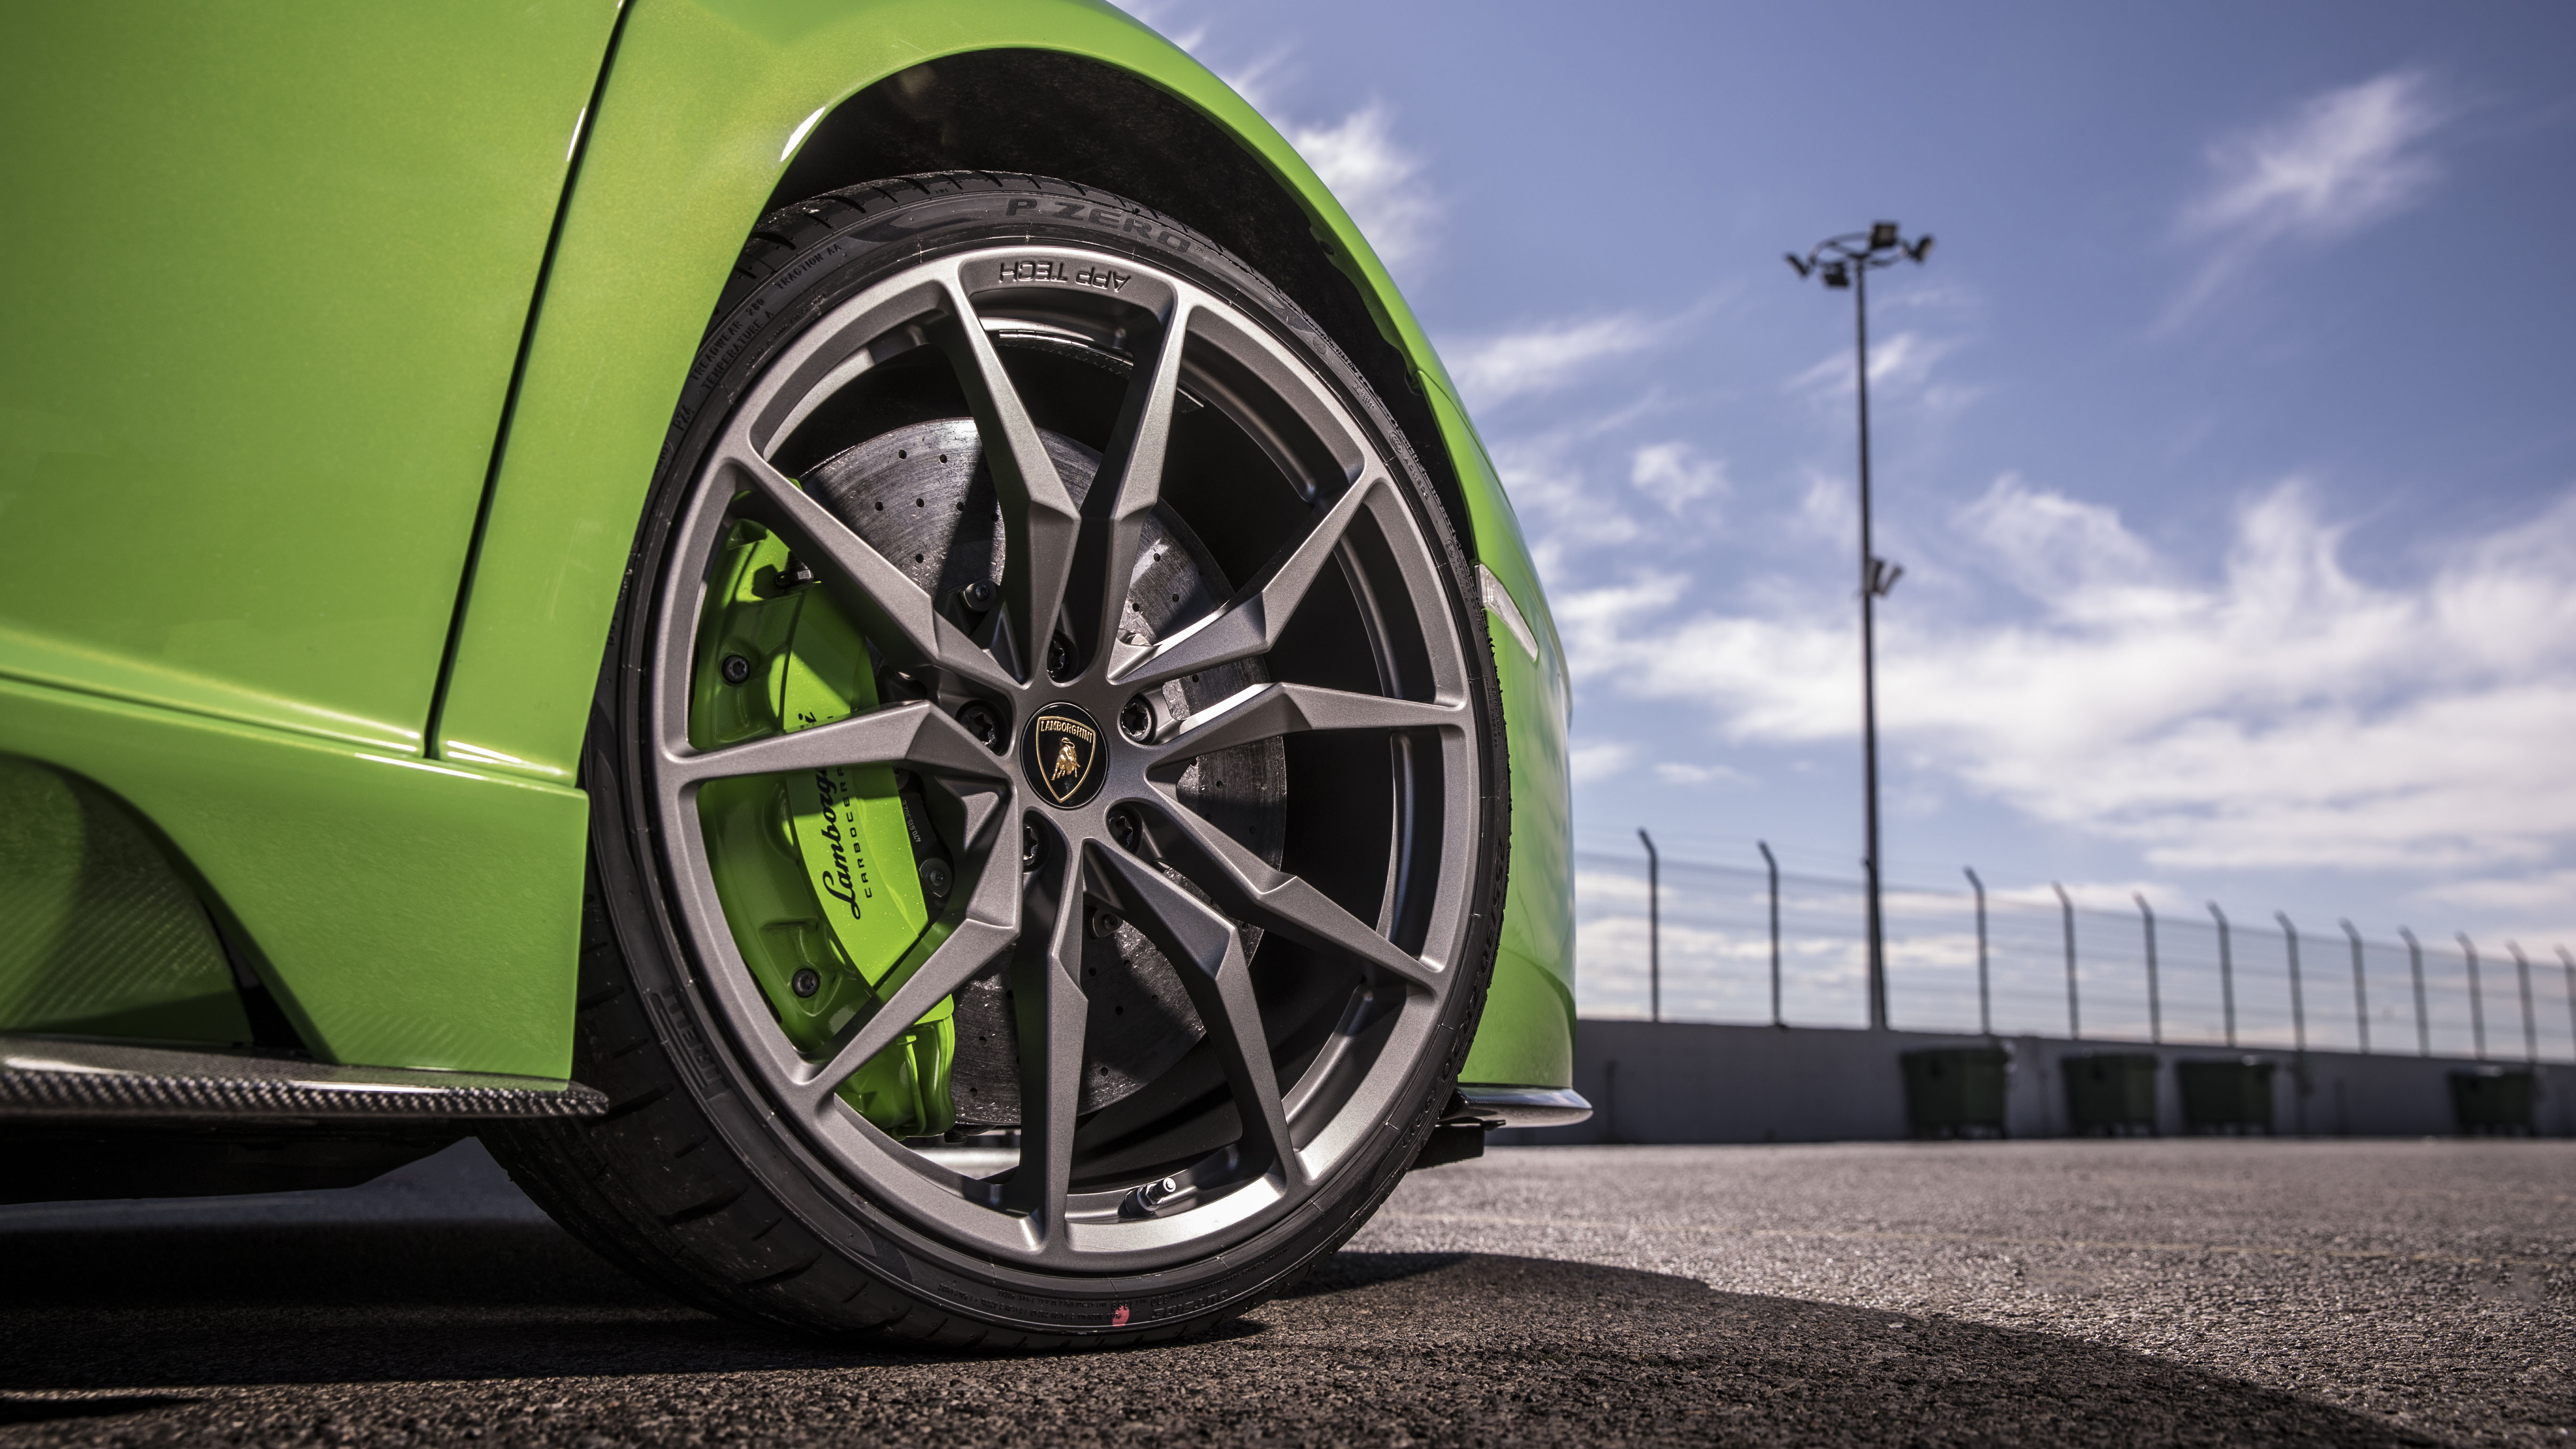 Lamborghini Aventador S wheels